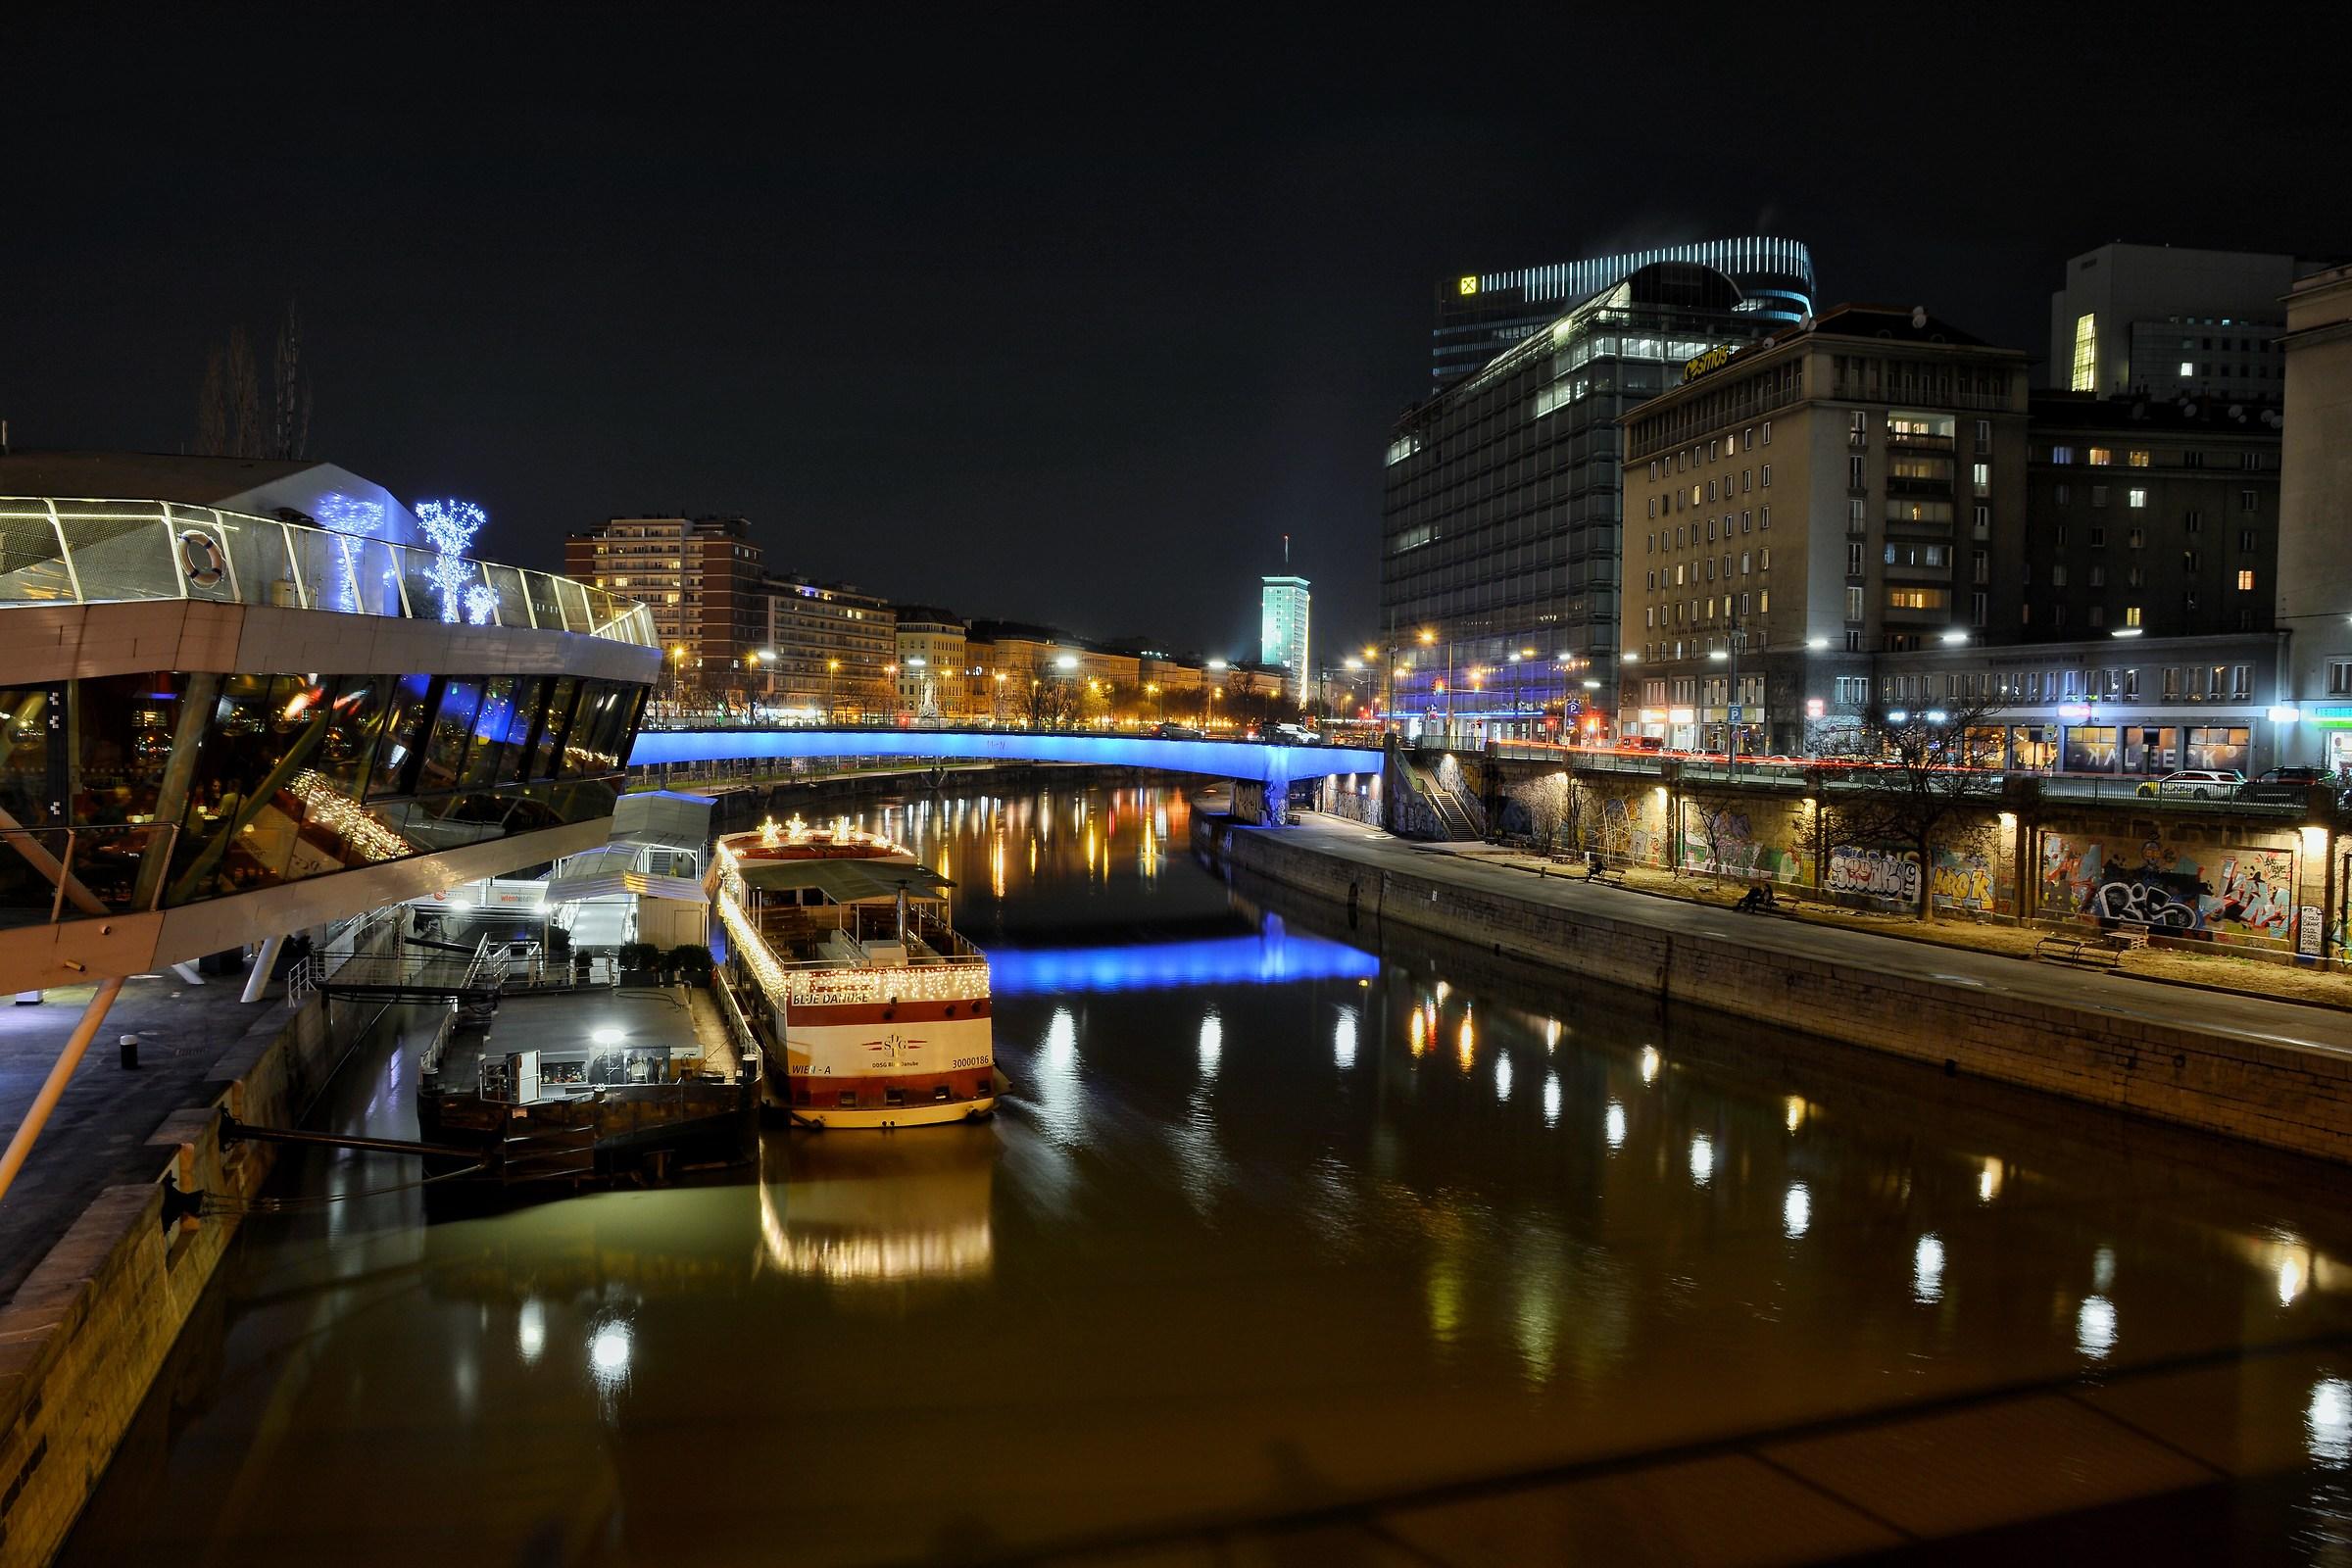 Vienna at night...